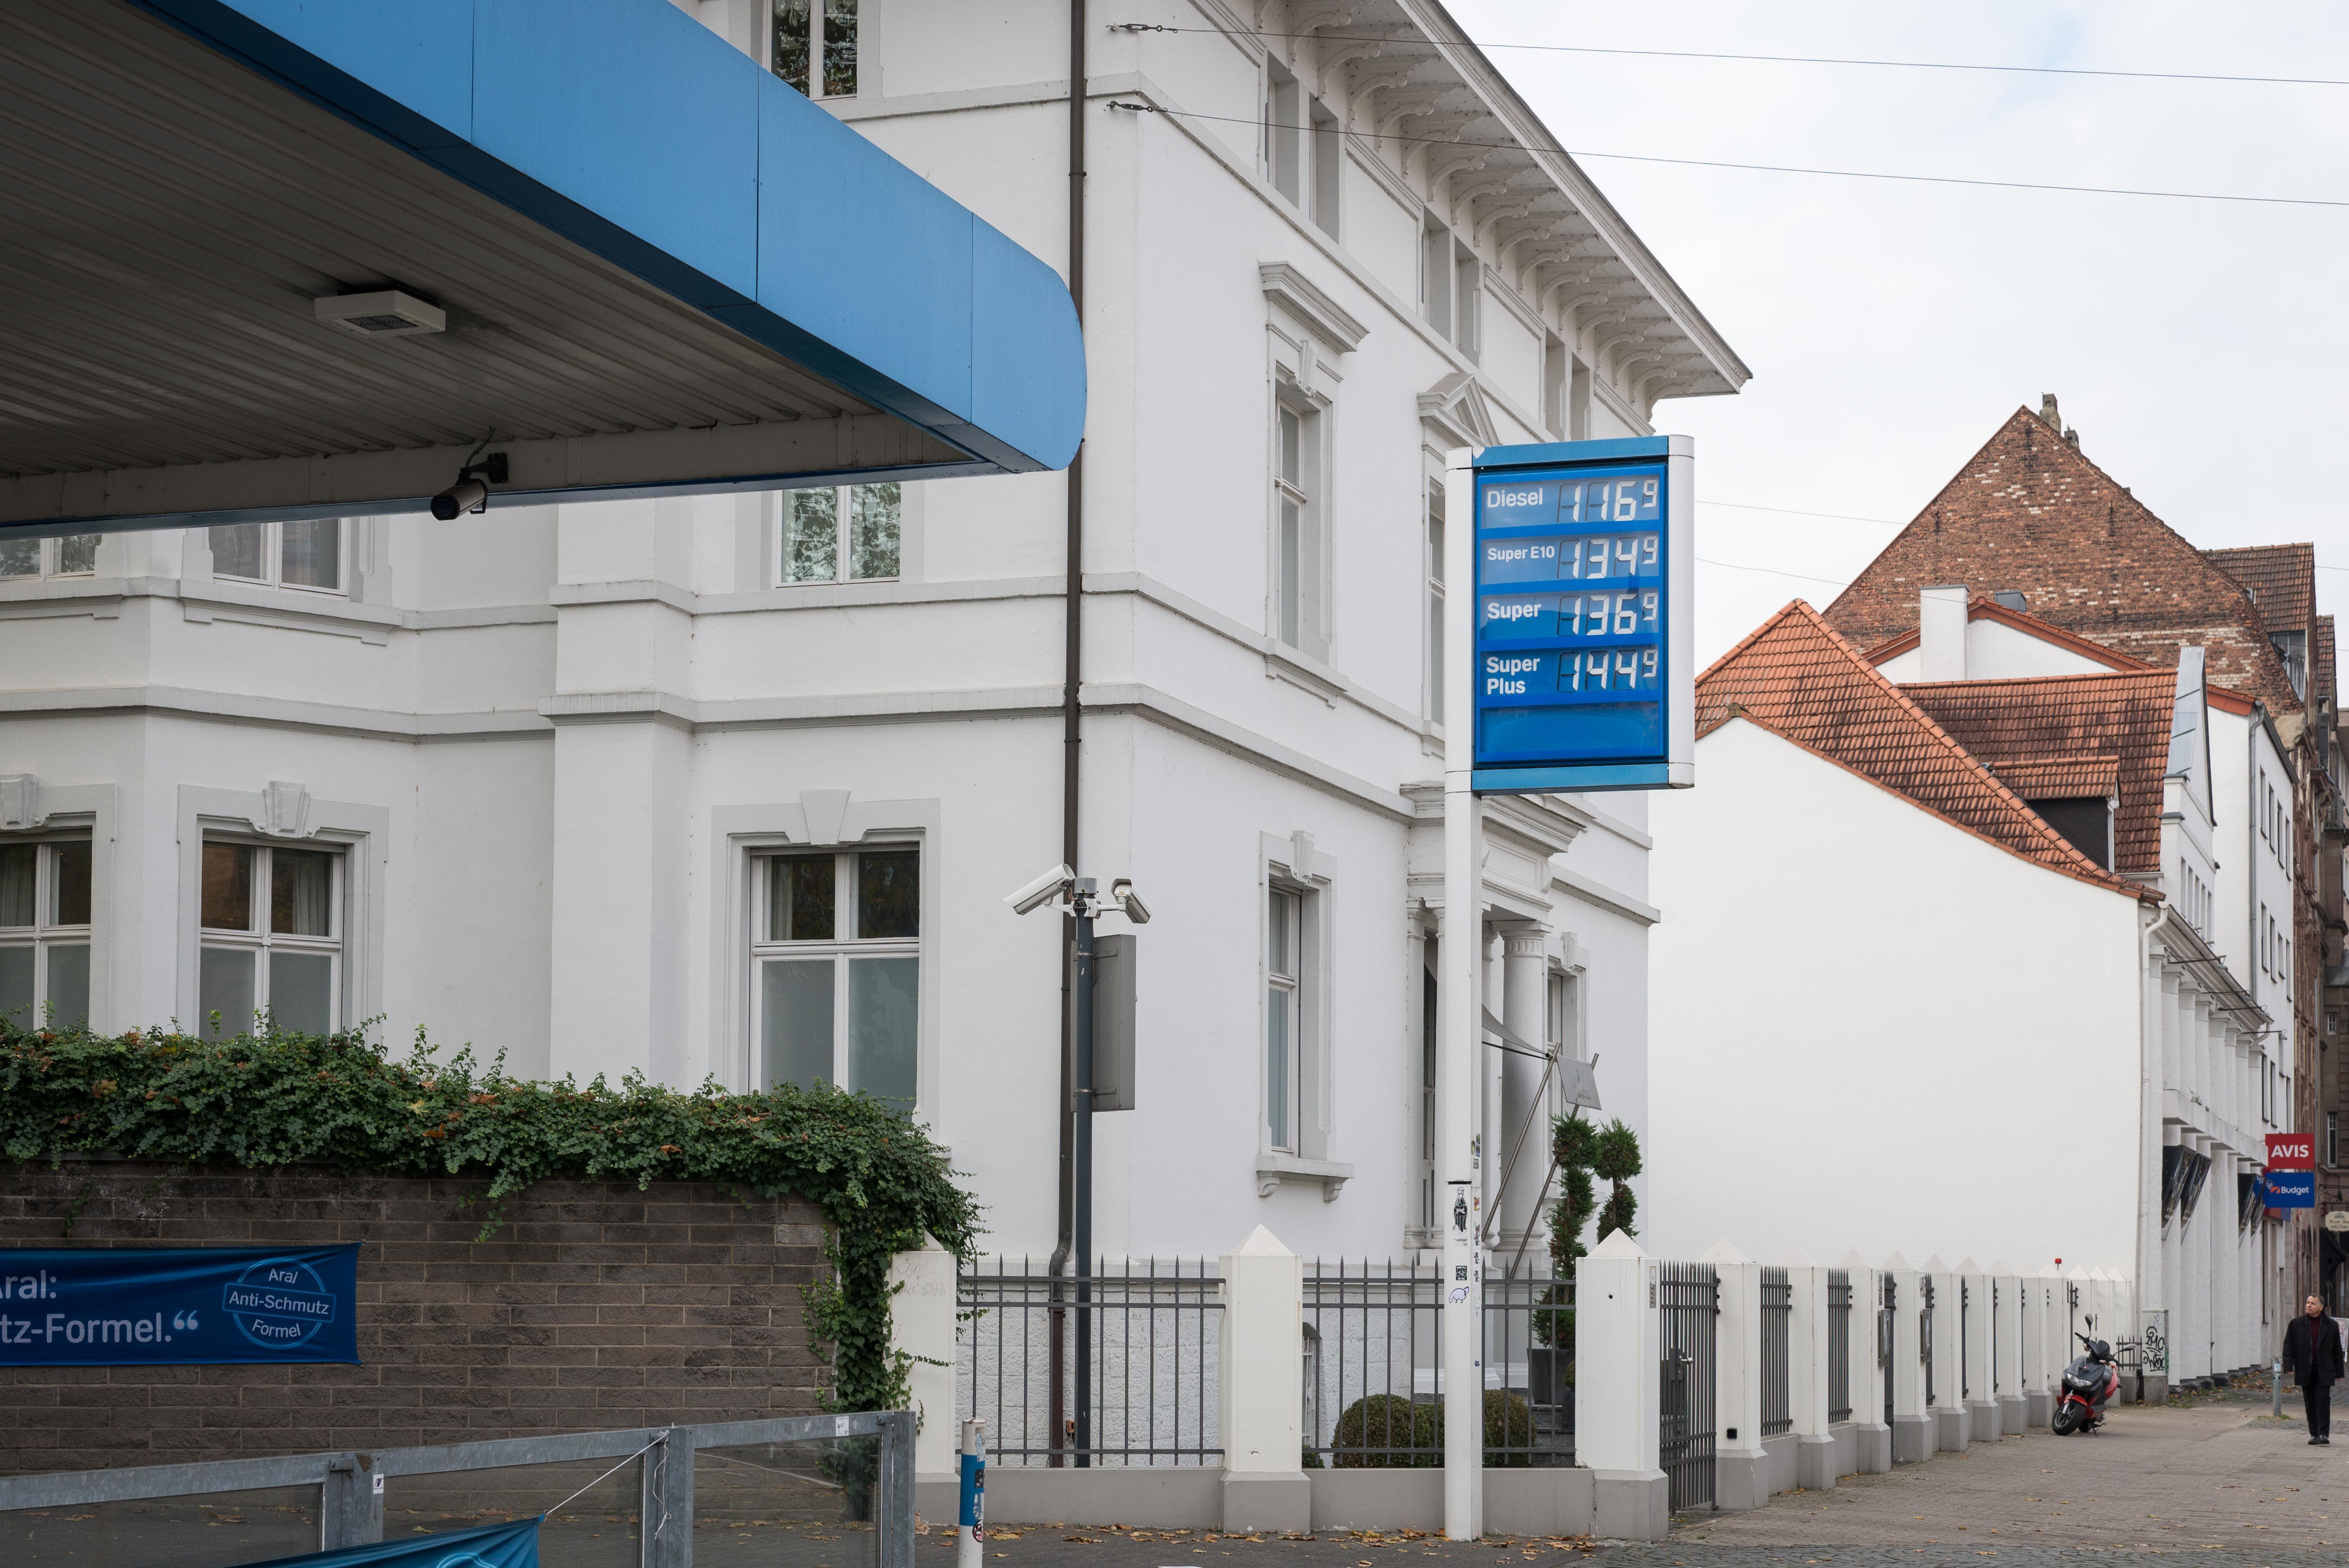 Erfort, Saarbrücken: Tankstelle